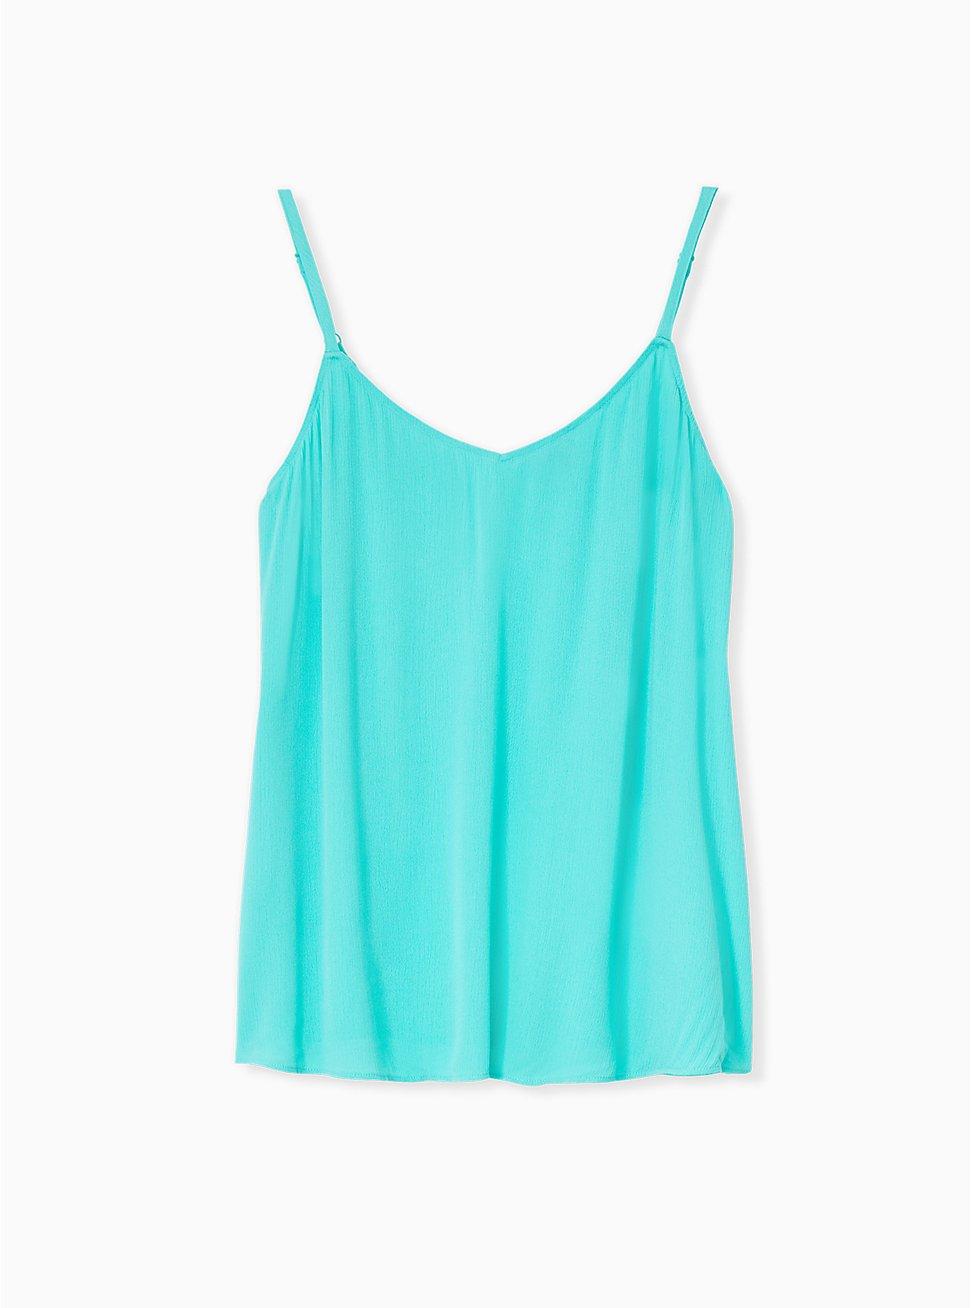 Sophie - Turquoise Gauze Swing Cami, AQUA GREEN, hi-res